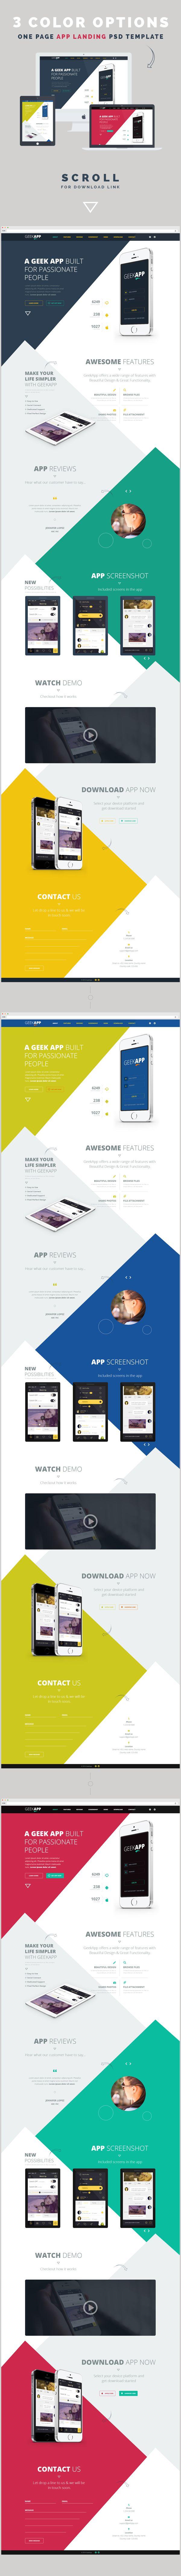 GeekApp - One Page App Landing PSD Template